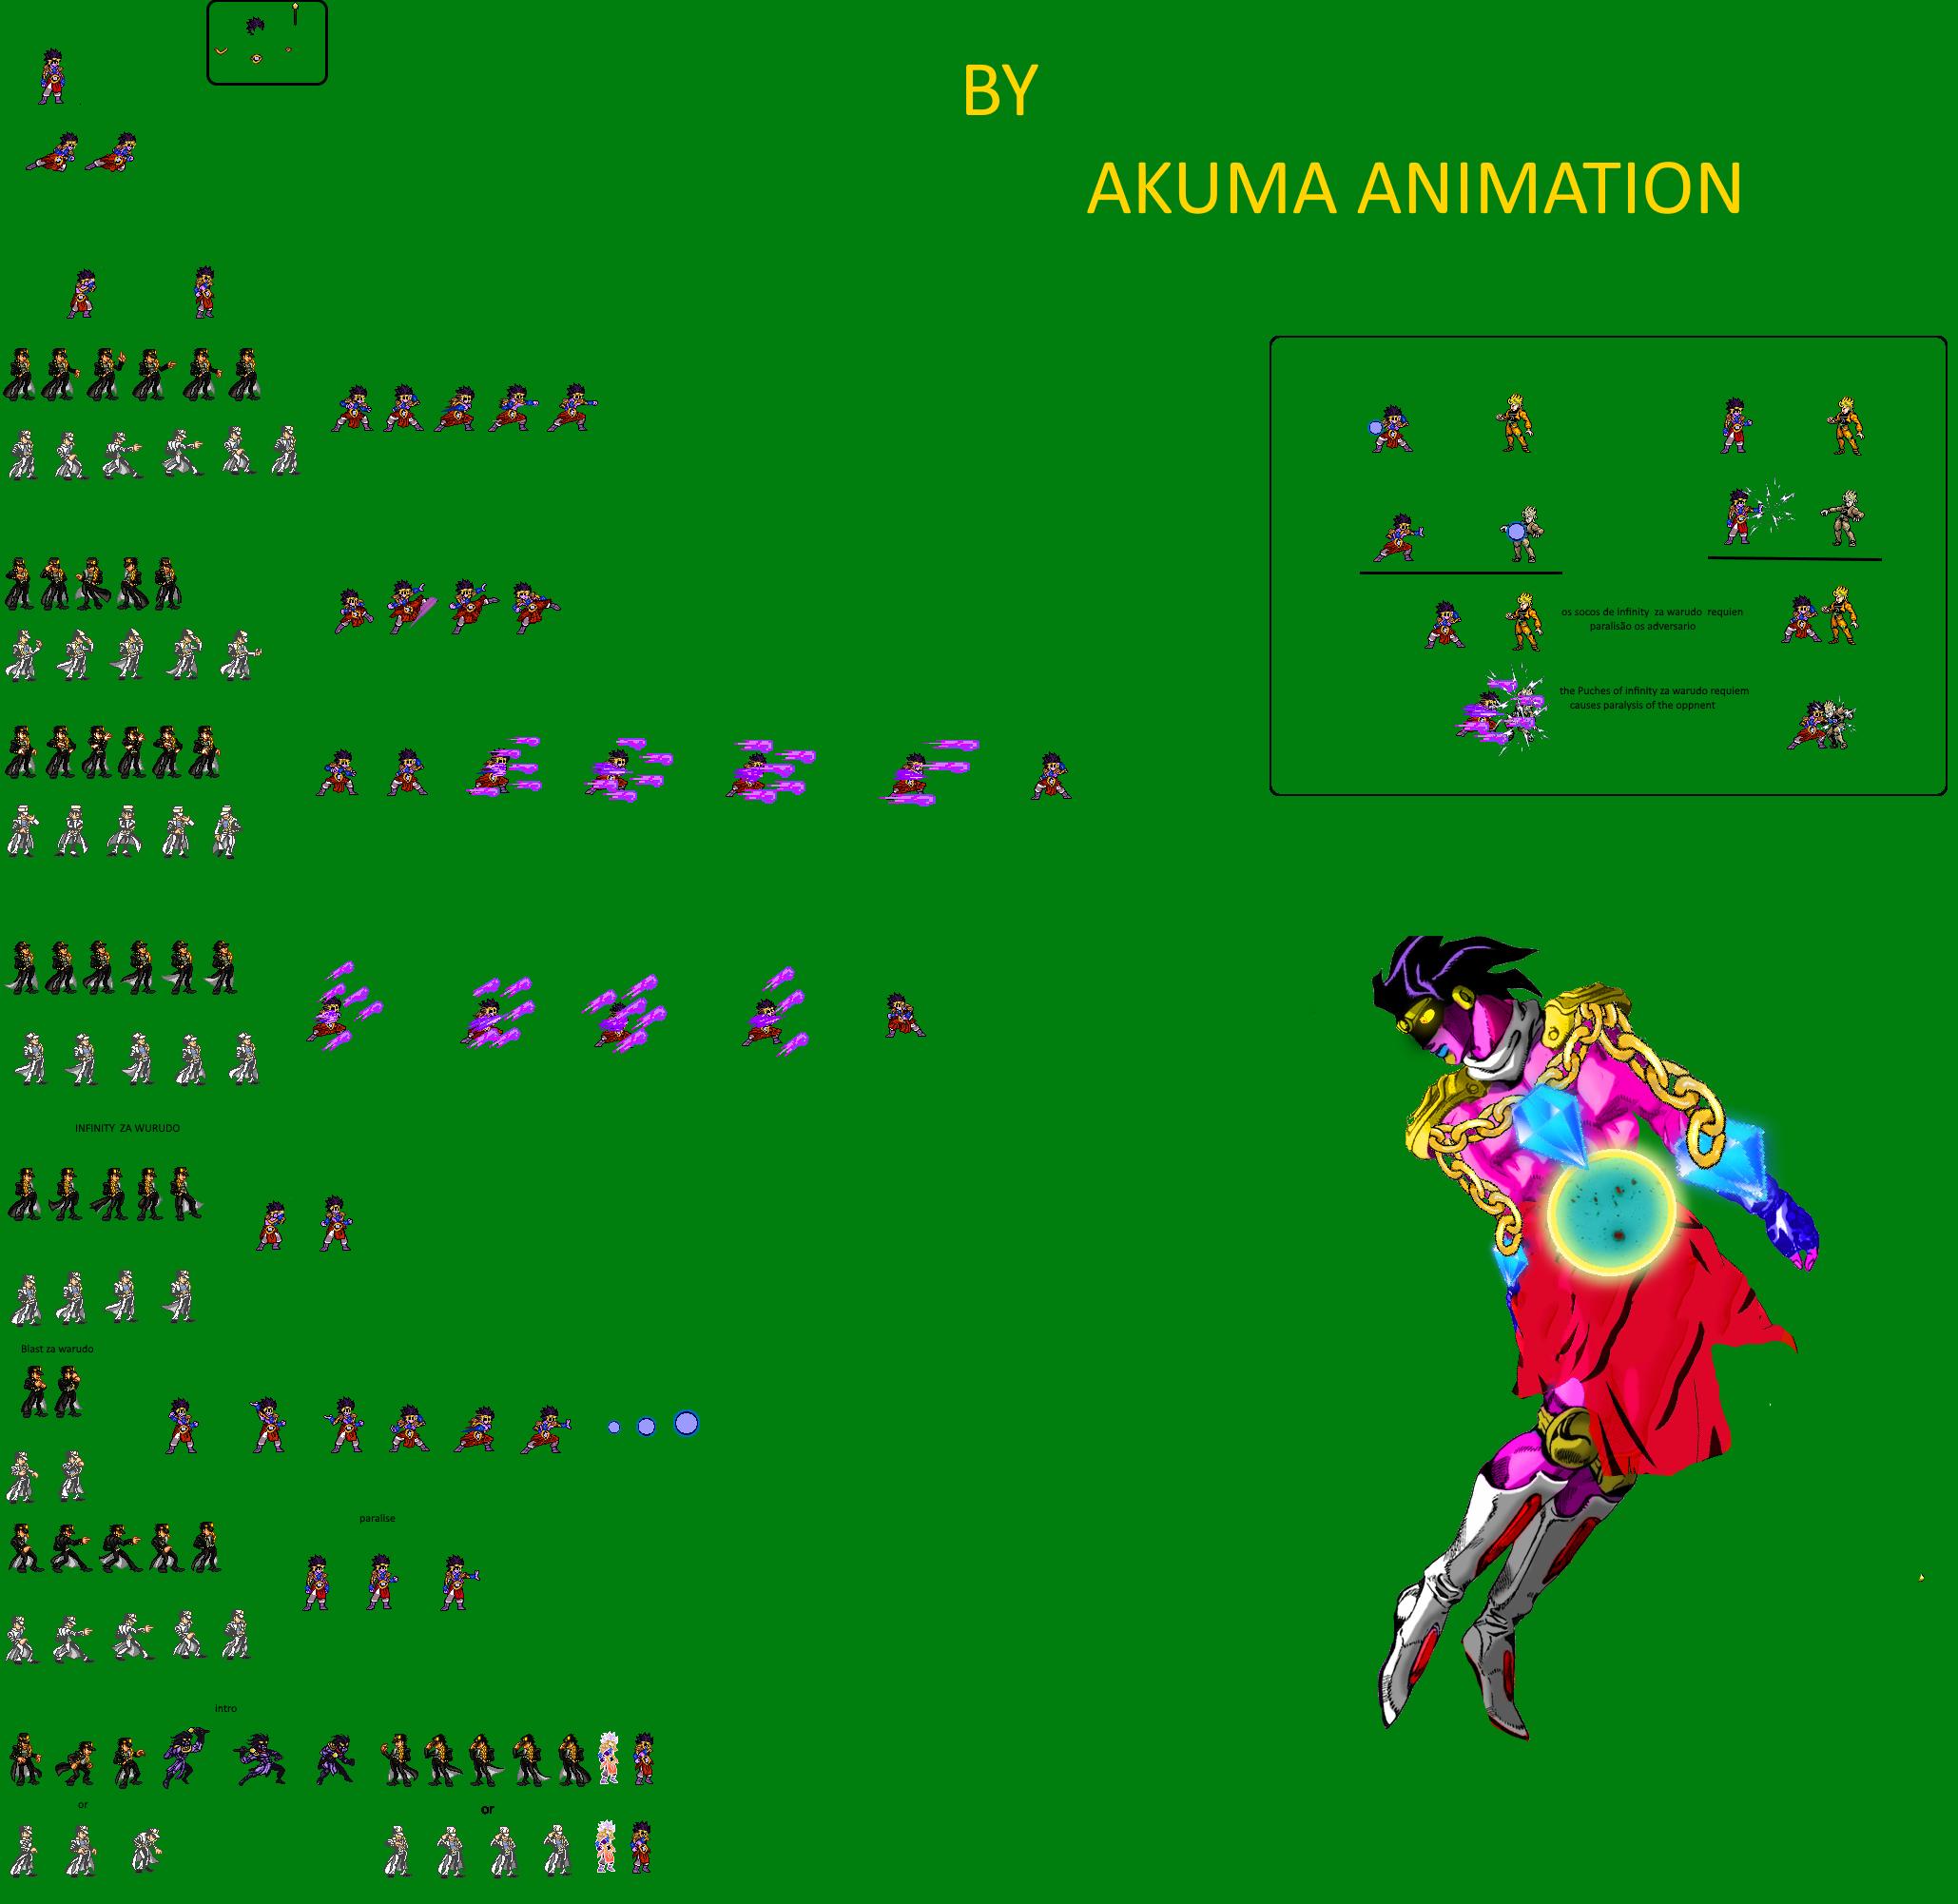 Jojo Star Platinum Requiem Jus Sprite Sheet By Akuma Animation098 On Deviantart